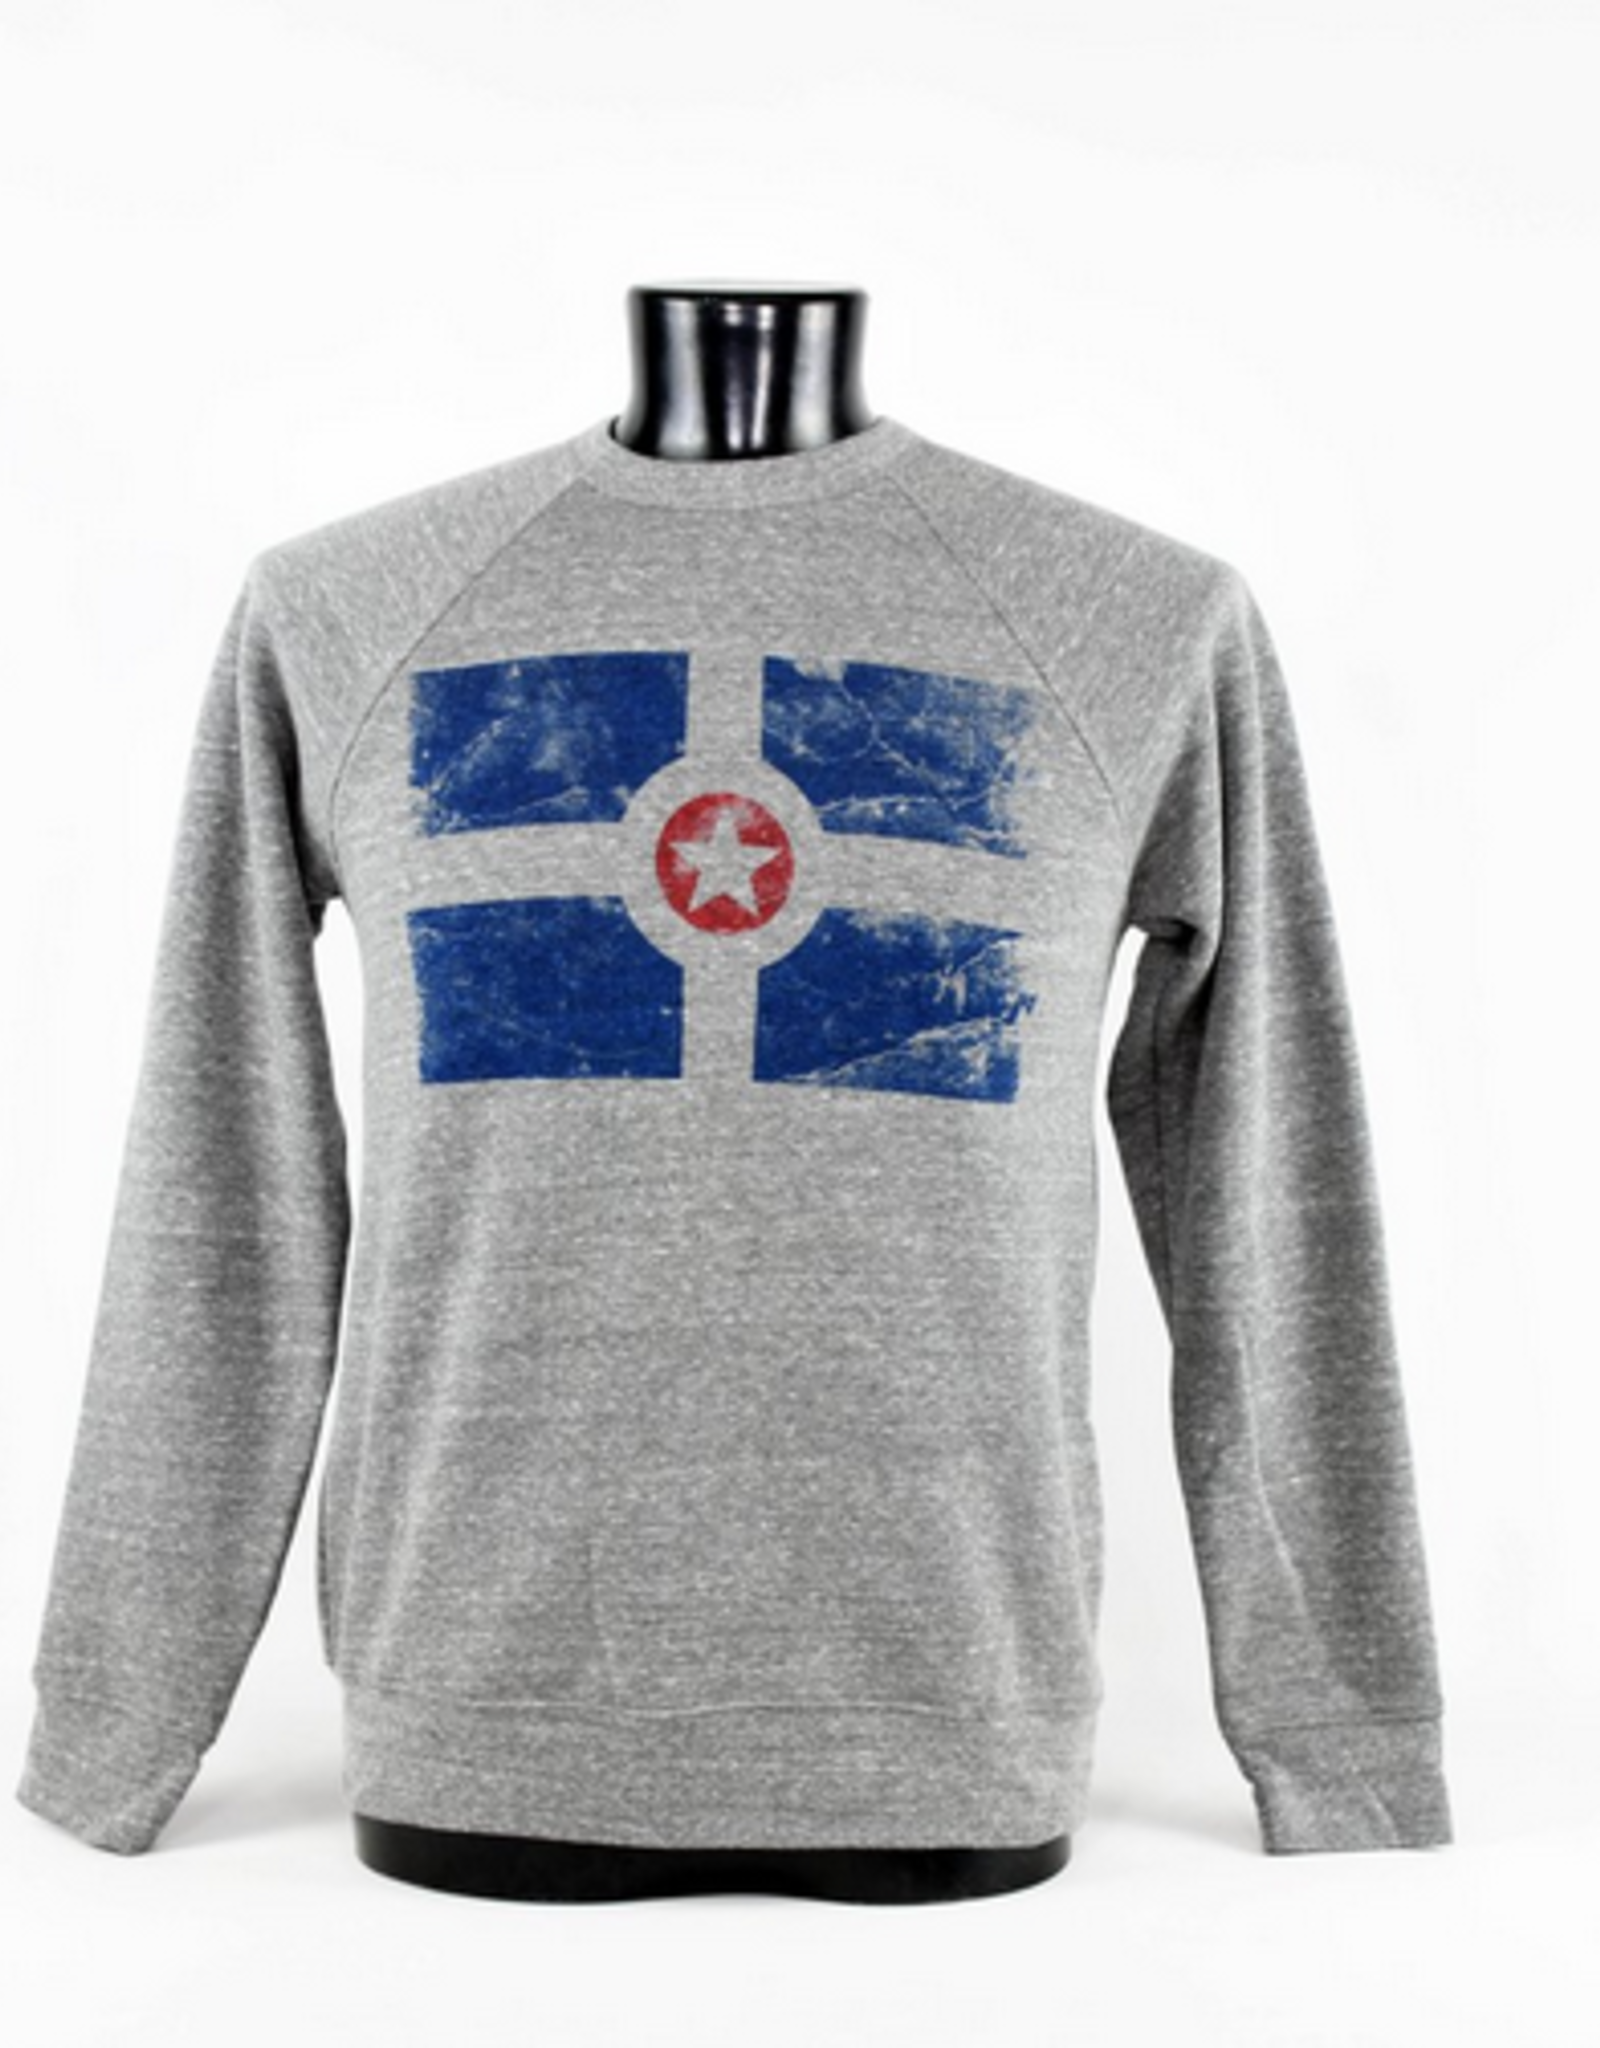 PUP Indy Flag Sweatshirt